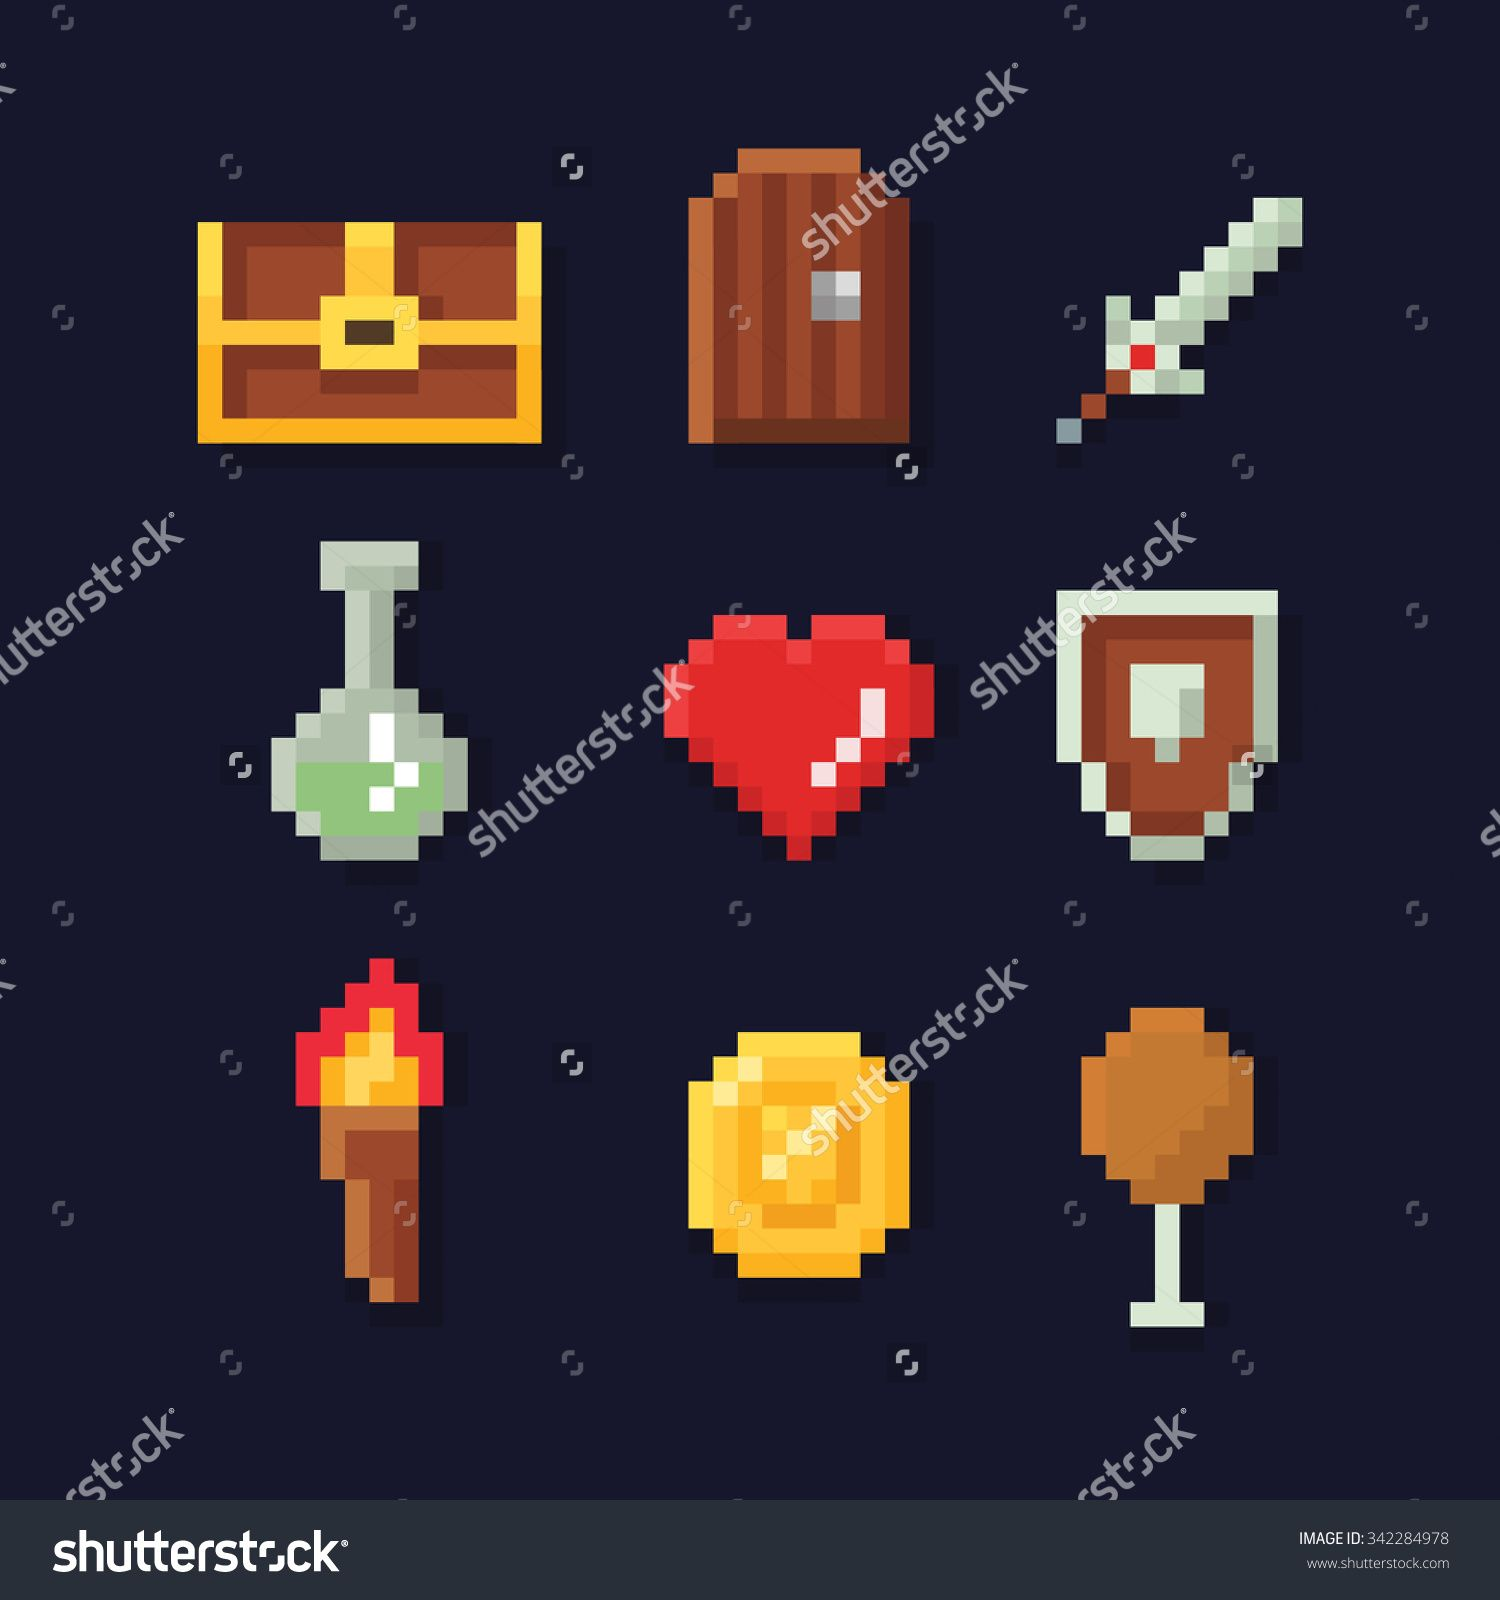 stock-vector-vector-pixel-art-illustration-isons-for-fantasy-adventure-game-development-magic-sword-food-342284978.jpg (1500×1600)